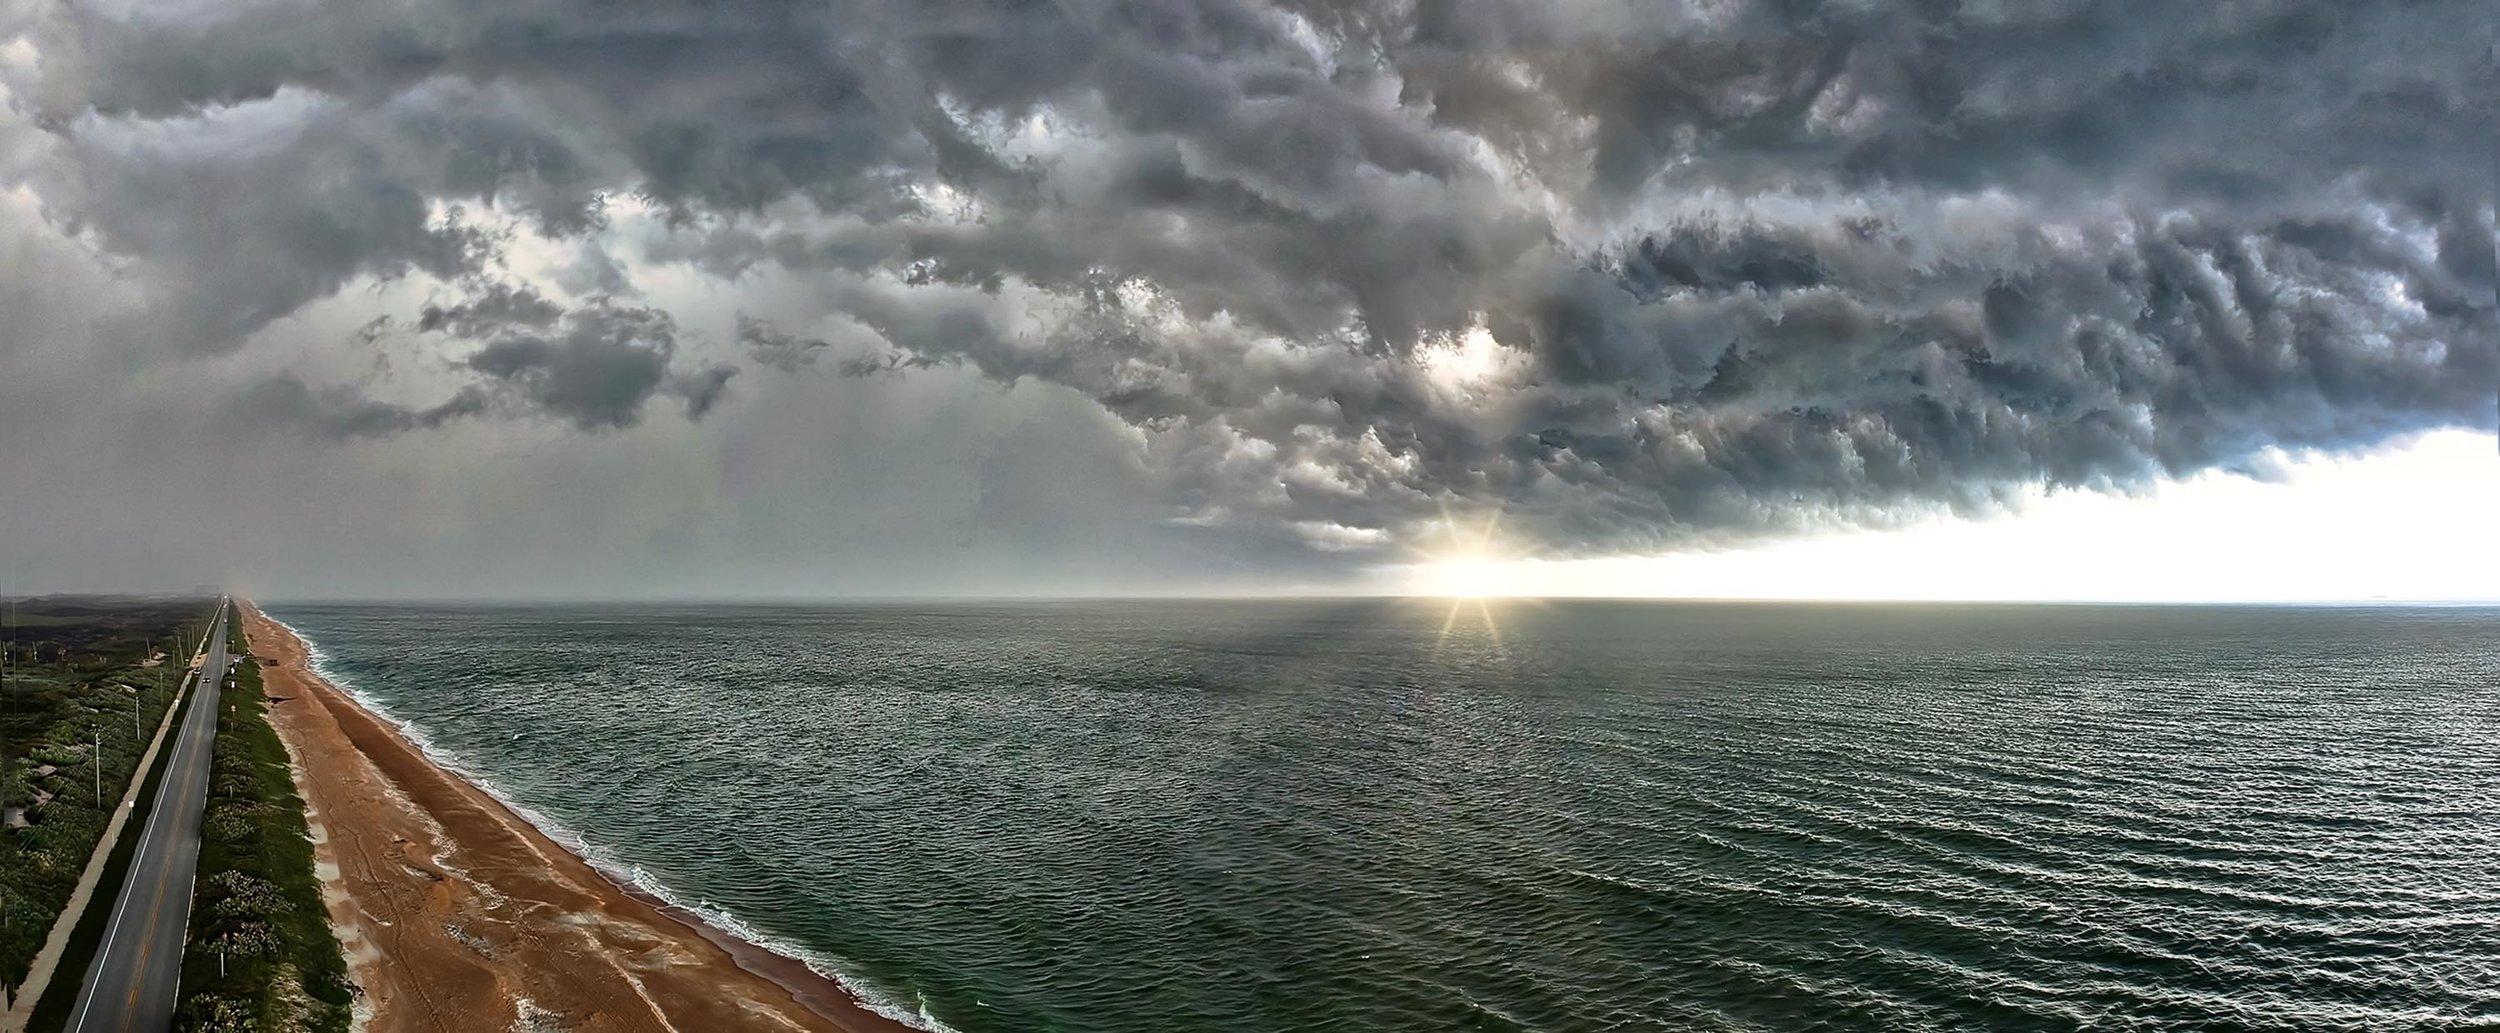 storm panorama s.jpg